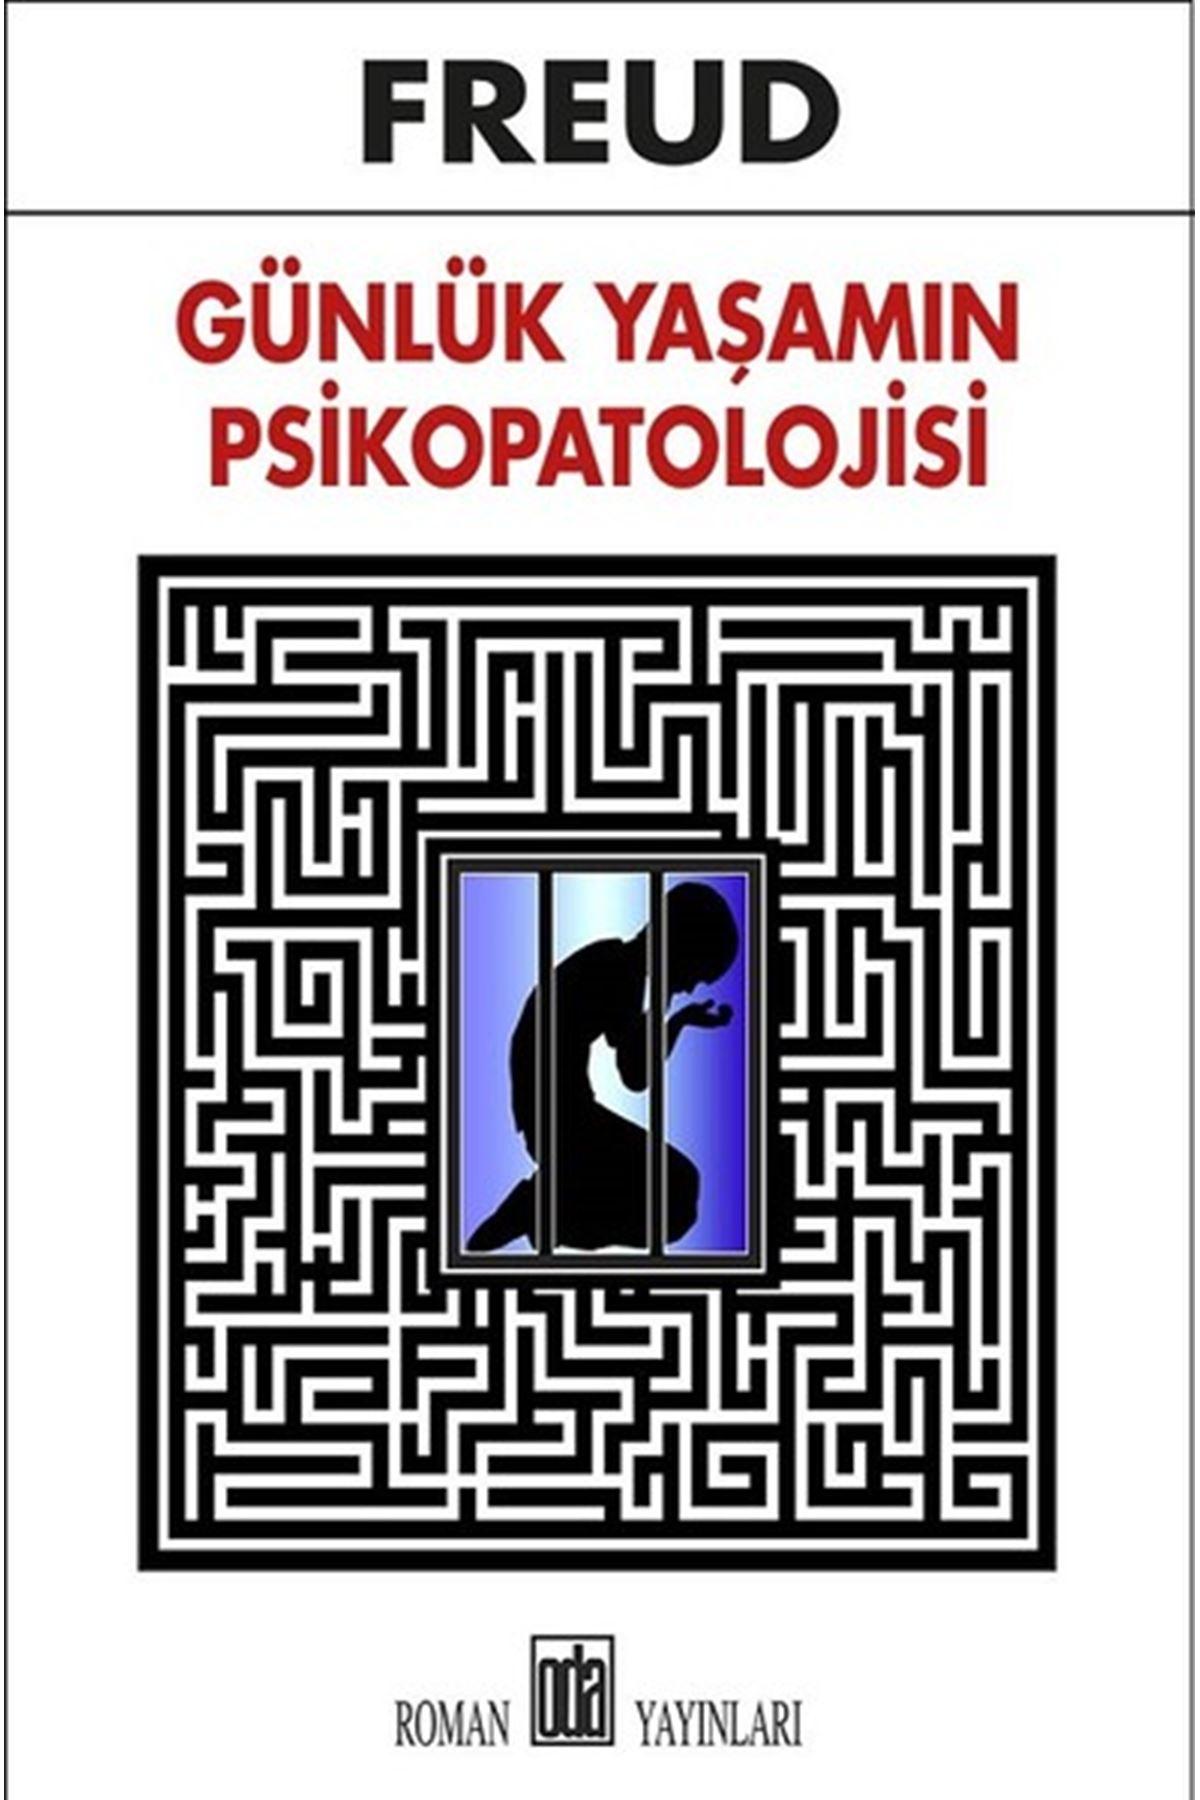 ELİF YILDIRIM - FREUD - GÜNLÜK YAŞAMIN PSİKOPATOLOJİSİ